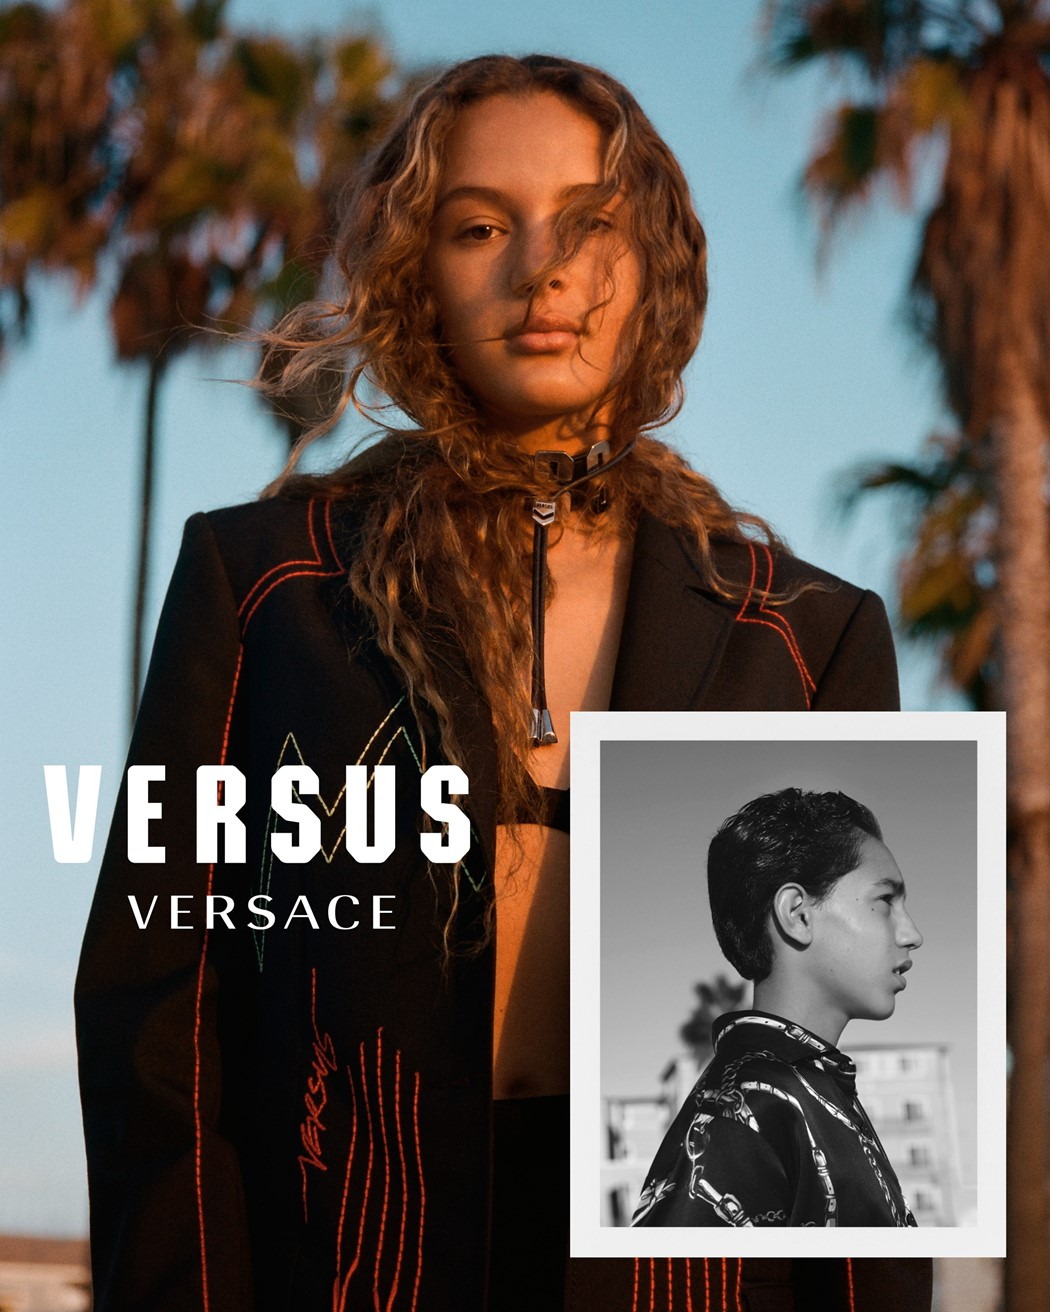 Versus Versace campaign